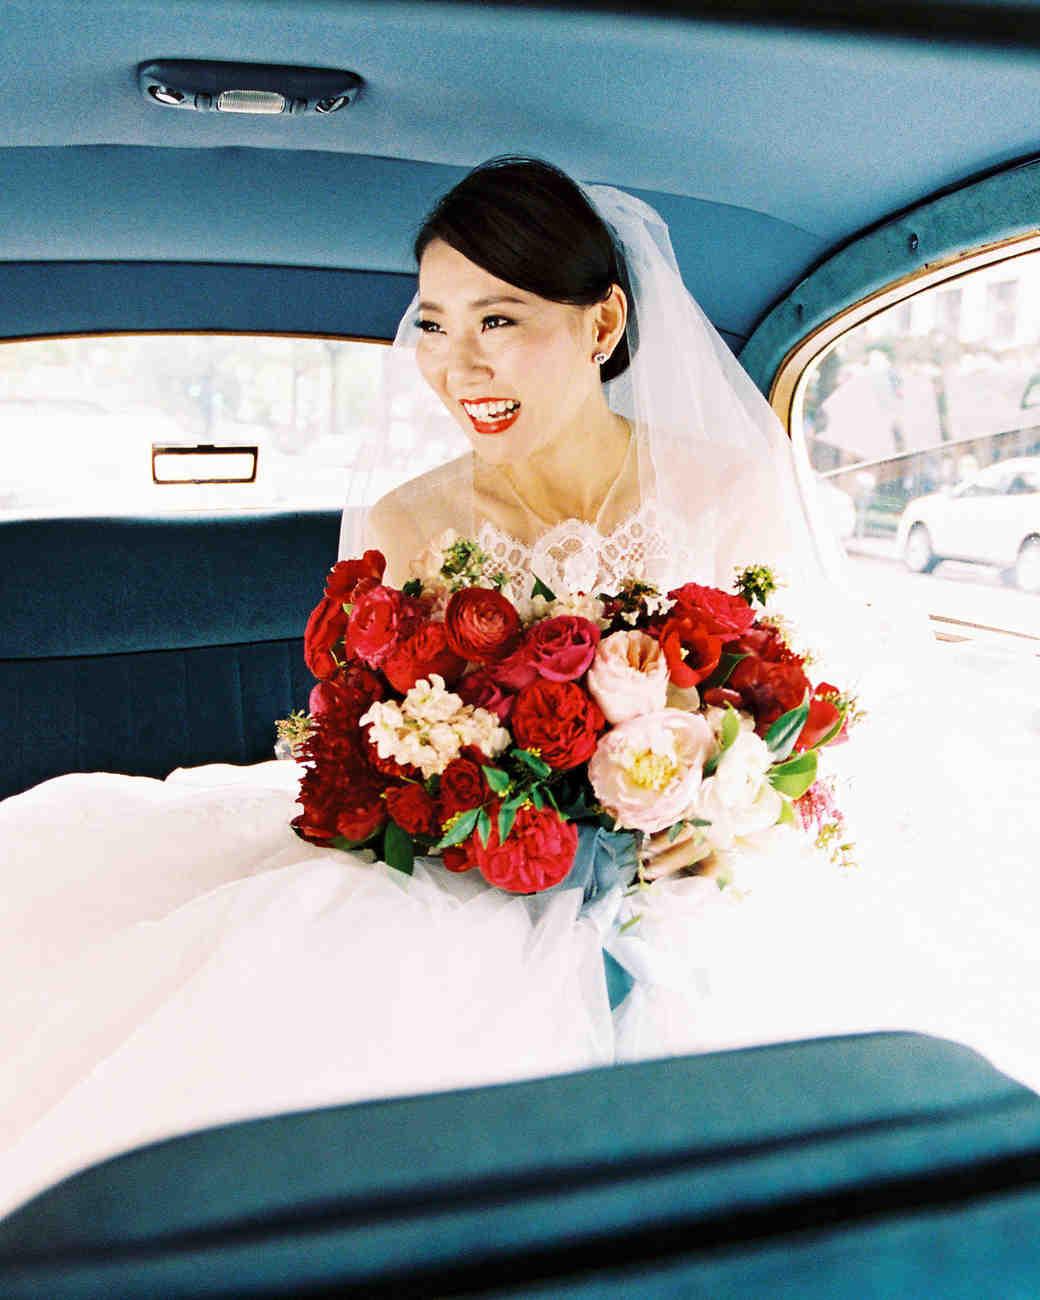 bold lipstick bride in back seat of vintage car